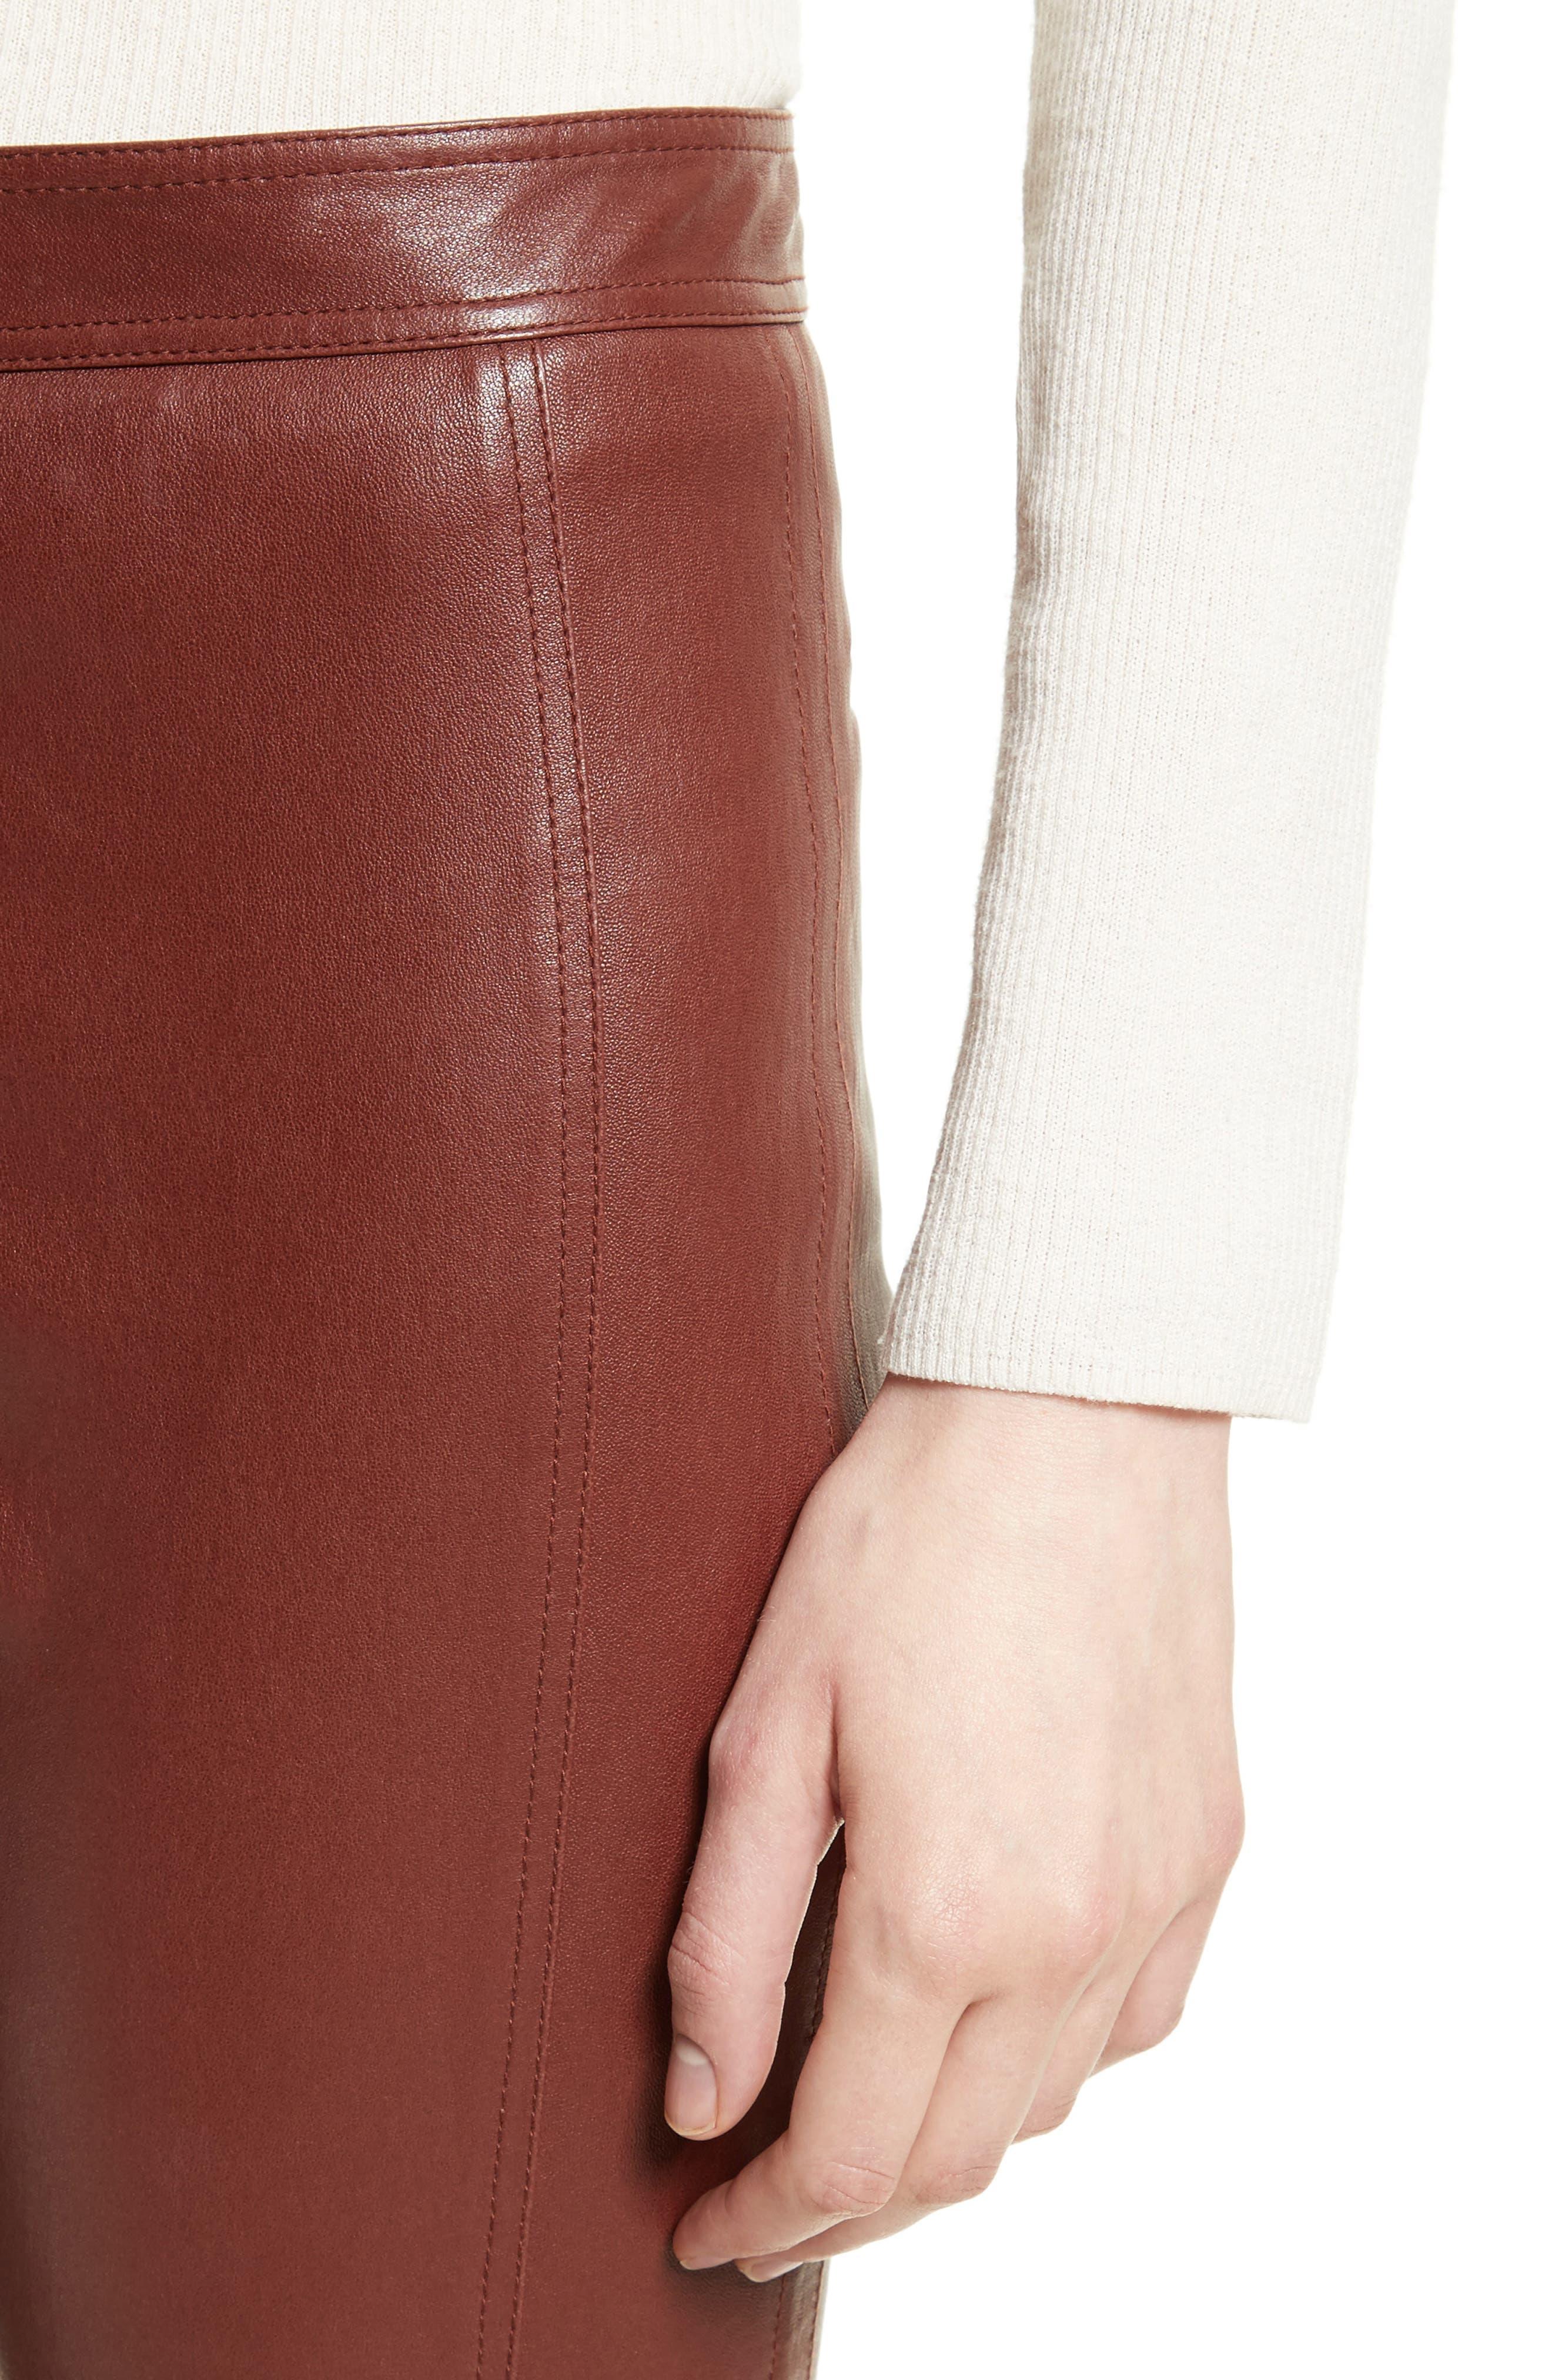 Bristol Leather Riding Pants,                             Alternate thumbnail 4, color,                             215